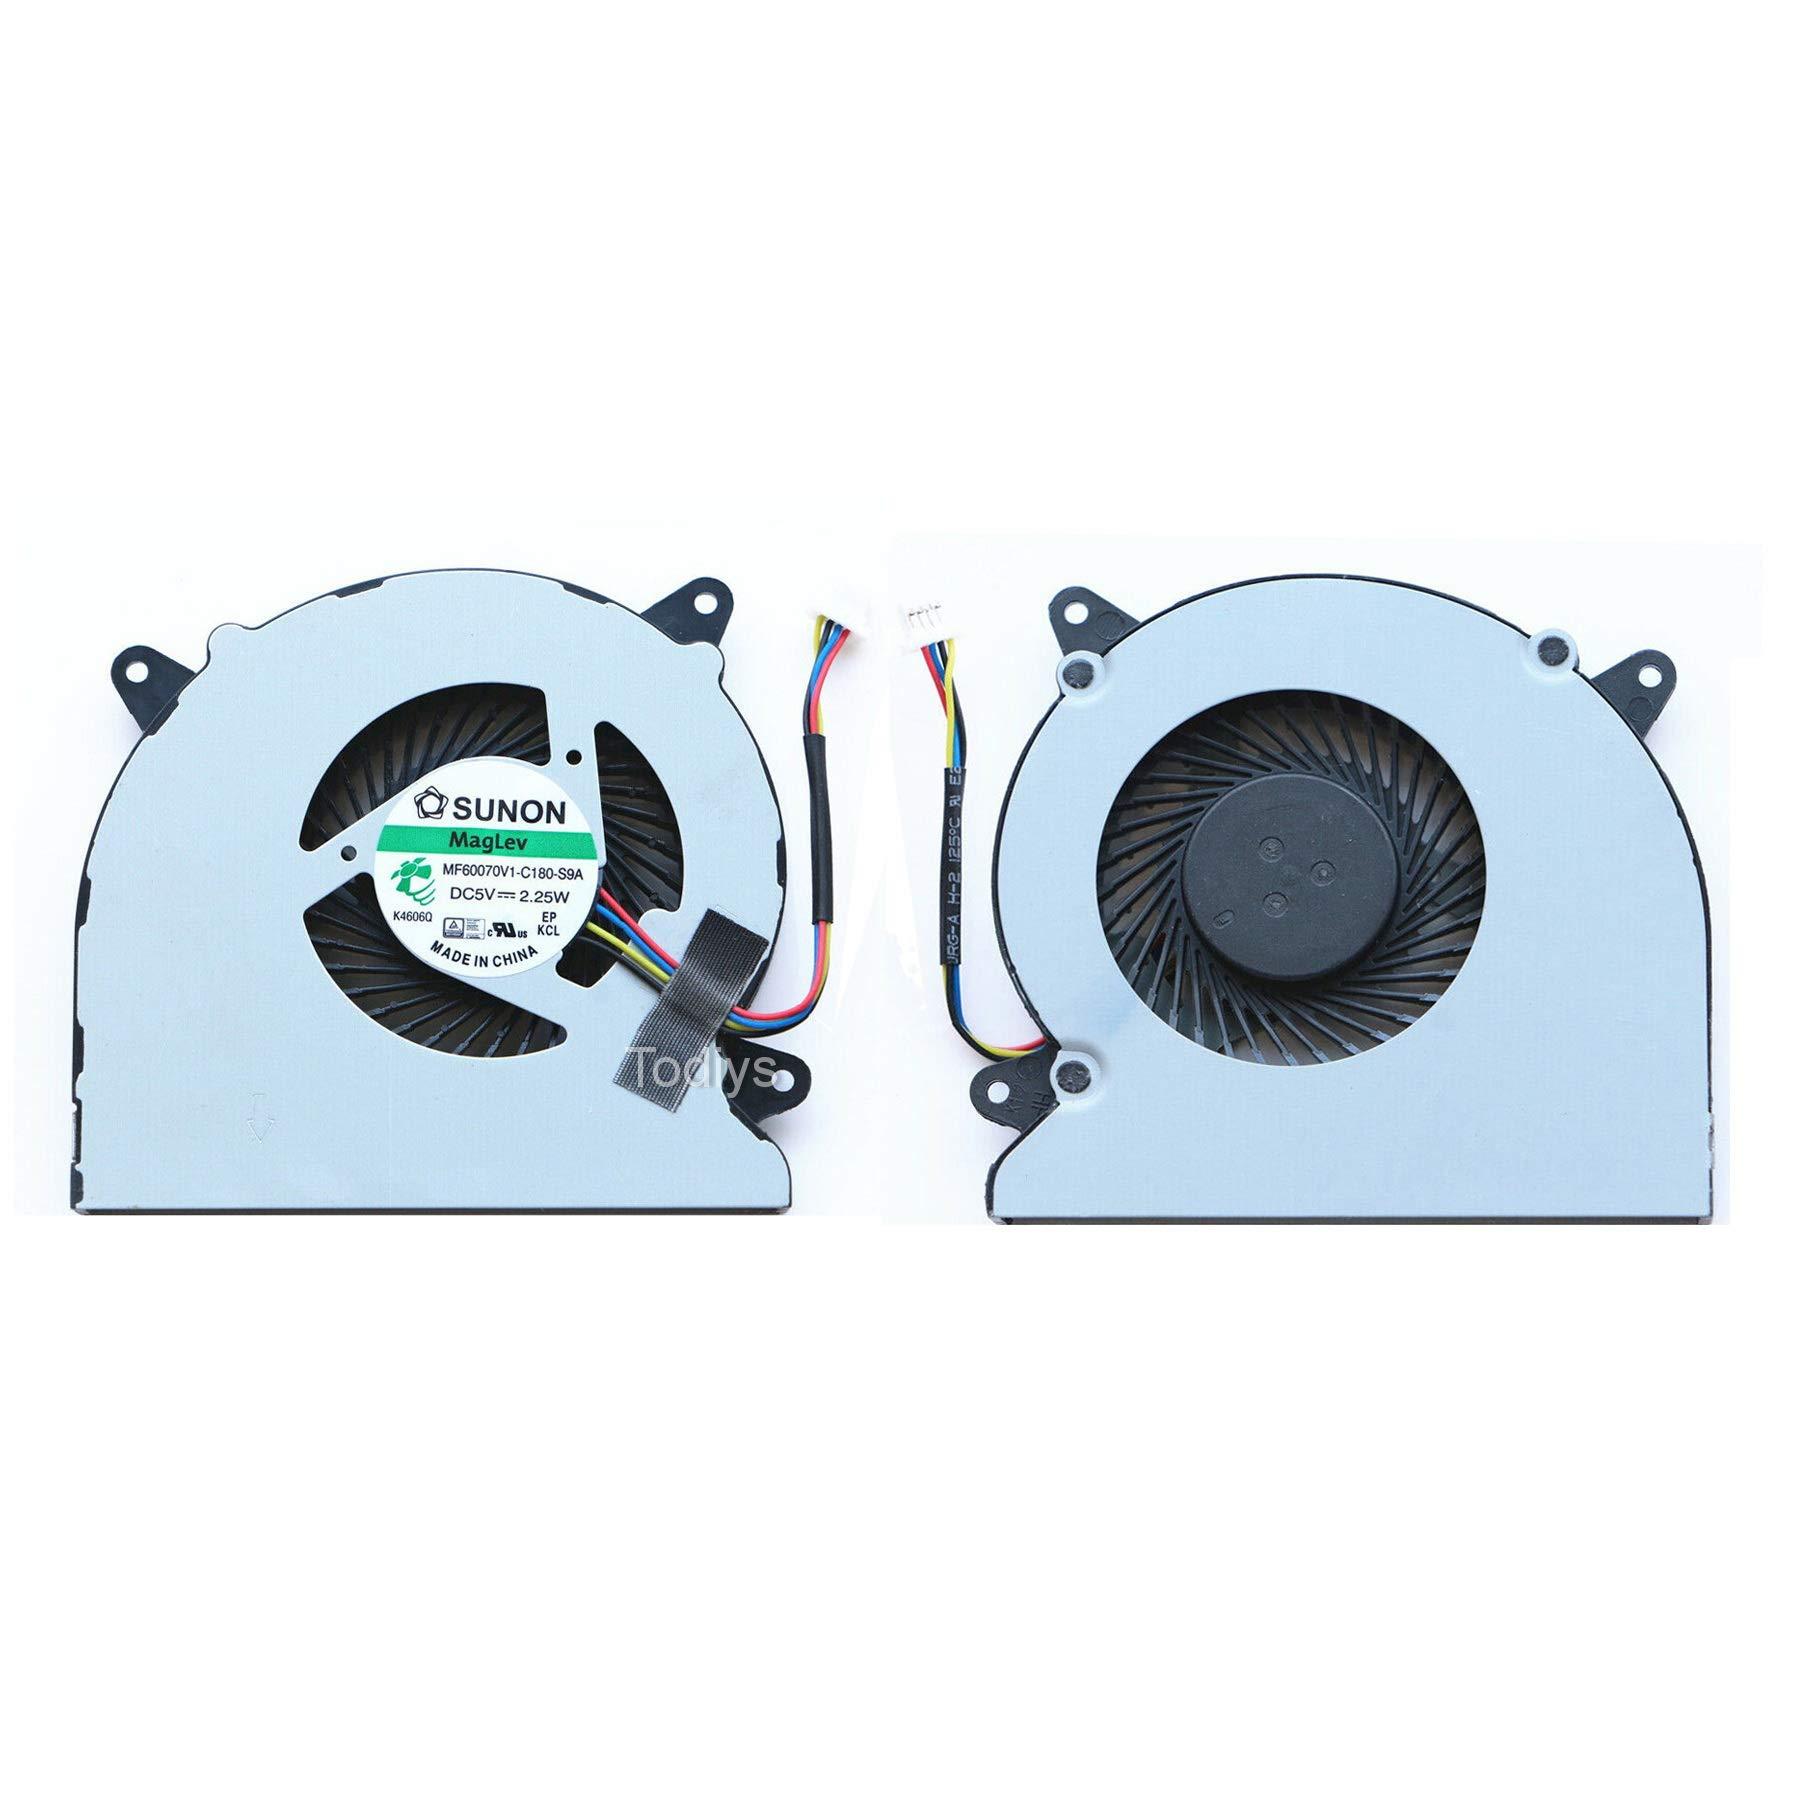 CPU Cooling Fan para Asus N550 N550J N550JA N550JV N550JK...